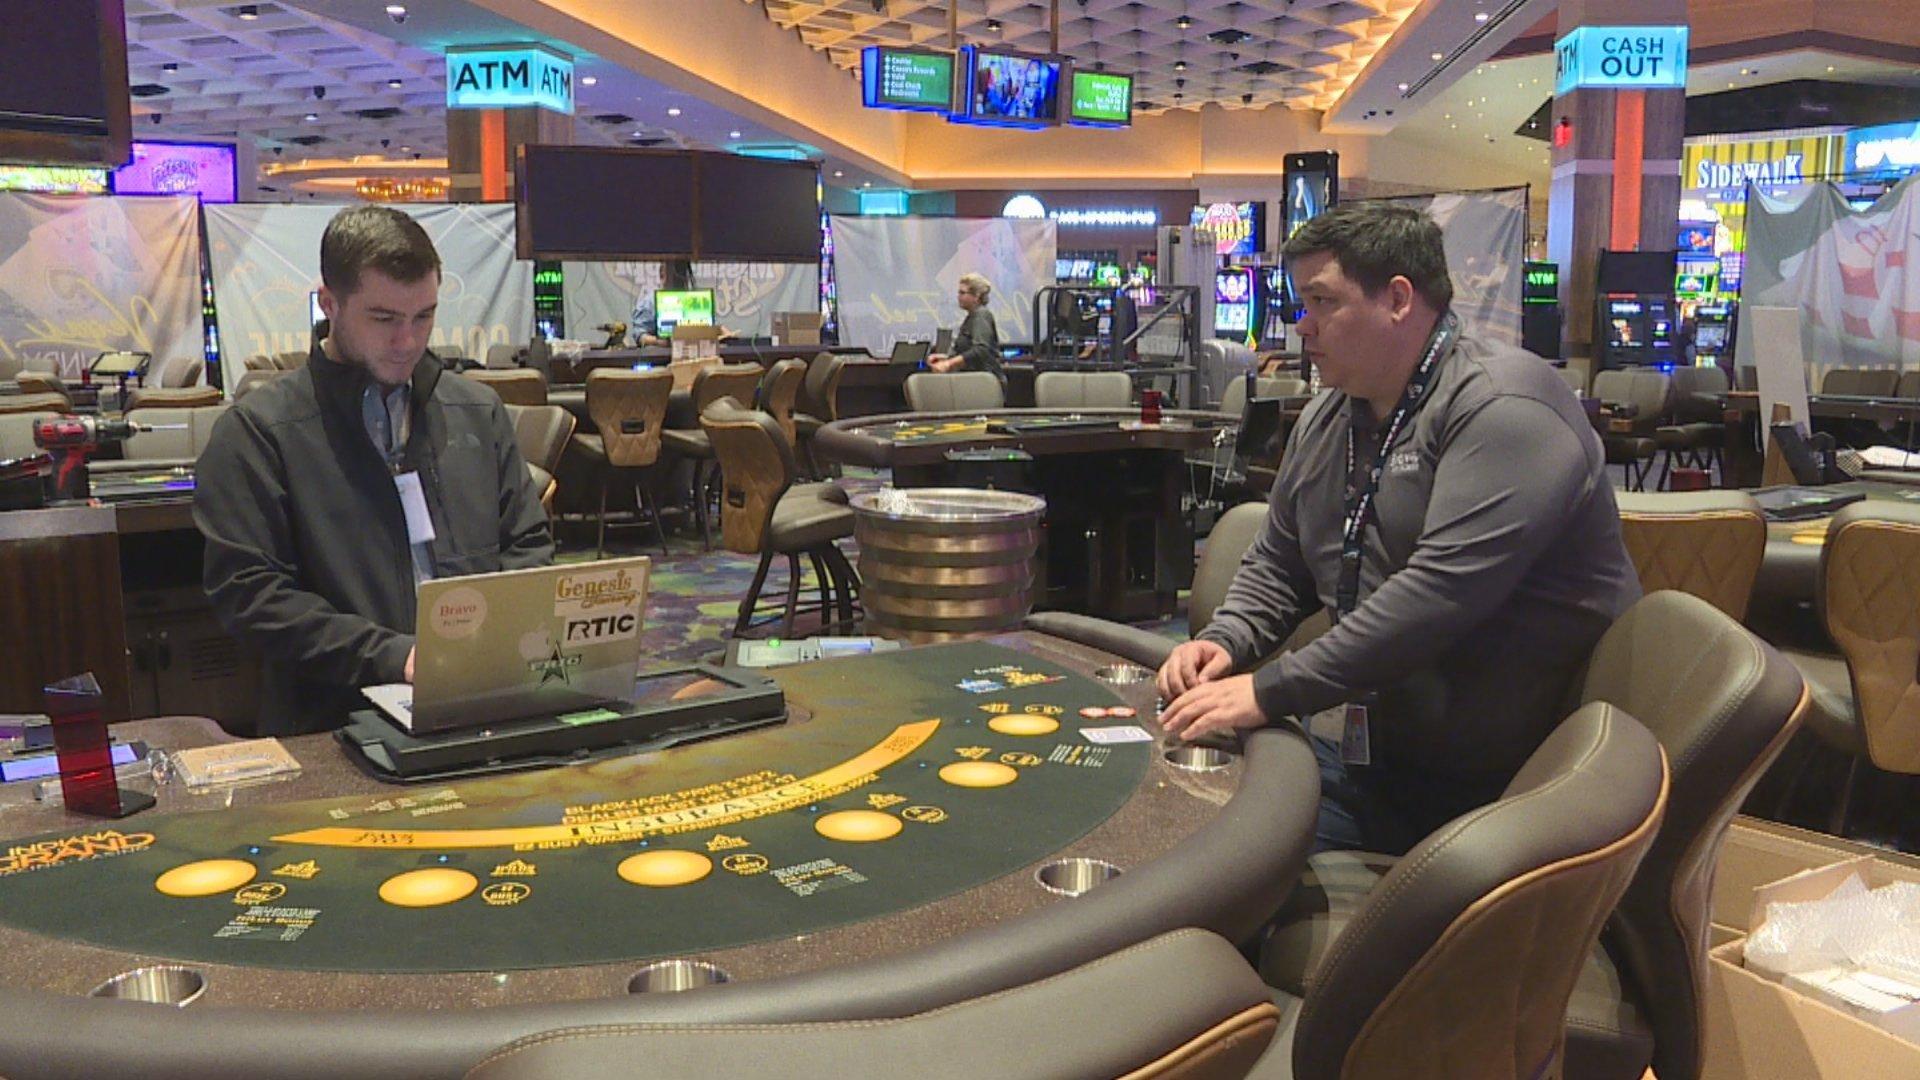 Indiana Grand Free Casino Cash